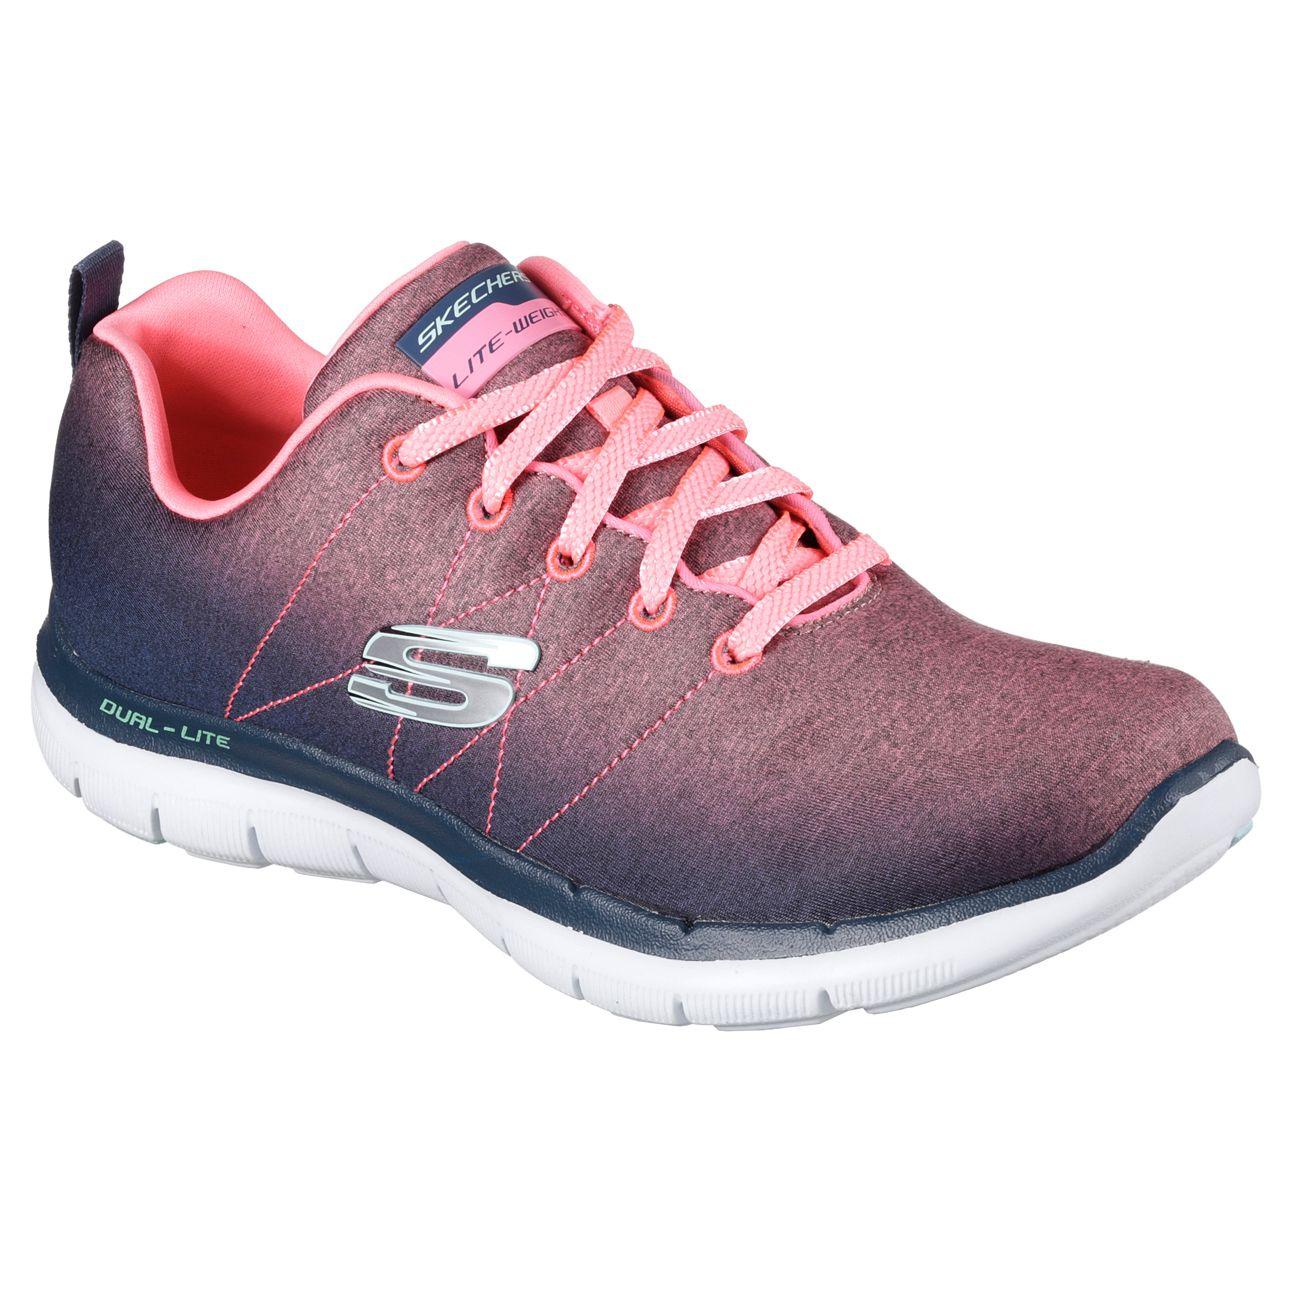 skechers flex appeal bright side ladies training shoes. Black Bedroom Furniture Sets. Home Design Ideas